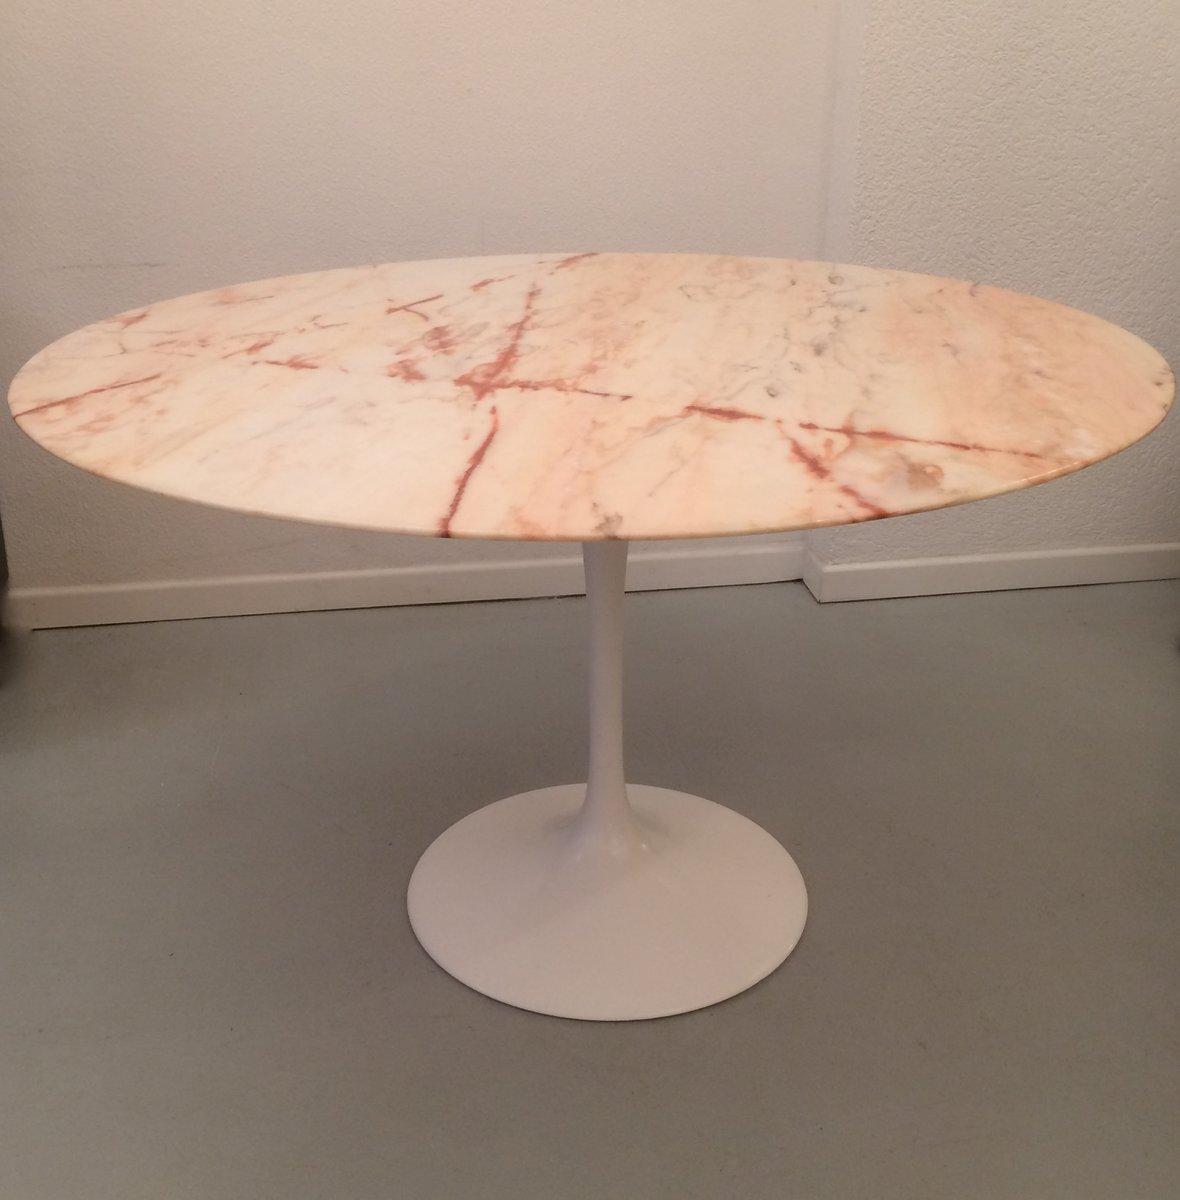 Pink Marble Tulip Dining Table By Eero Saarinen For Knoll